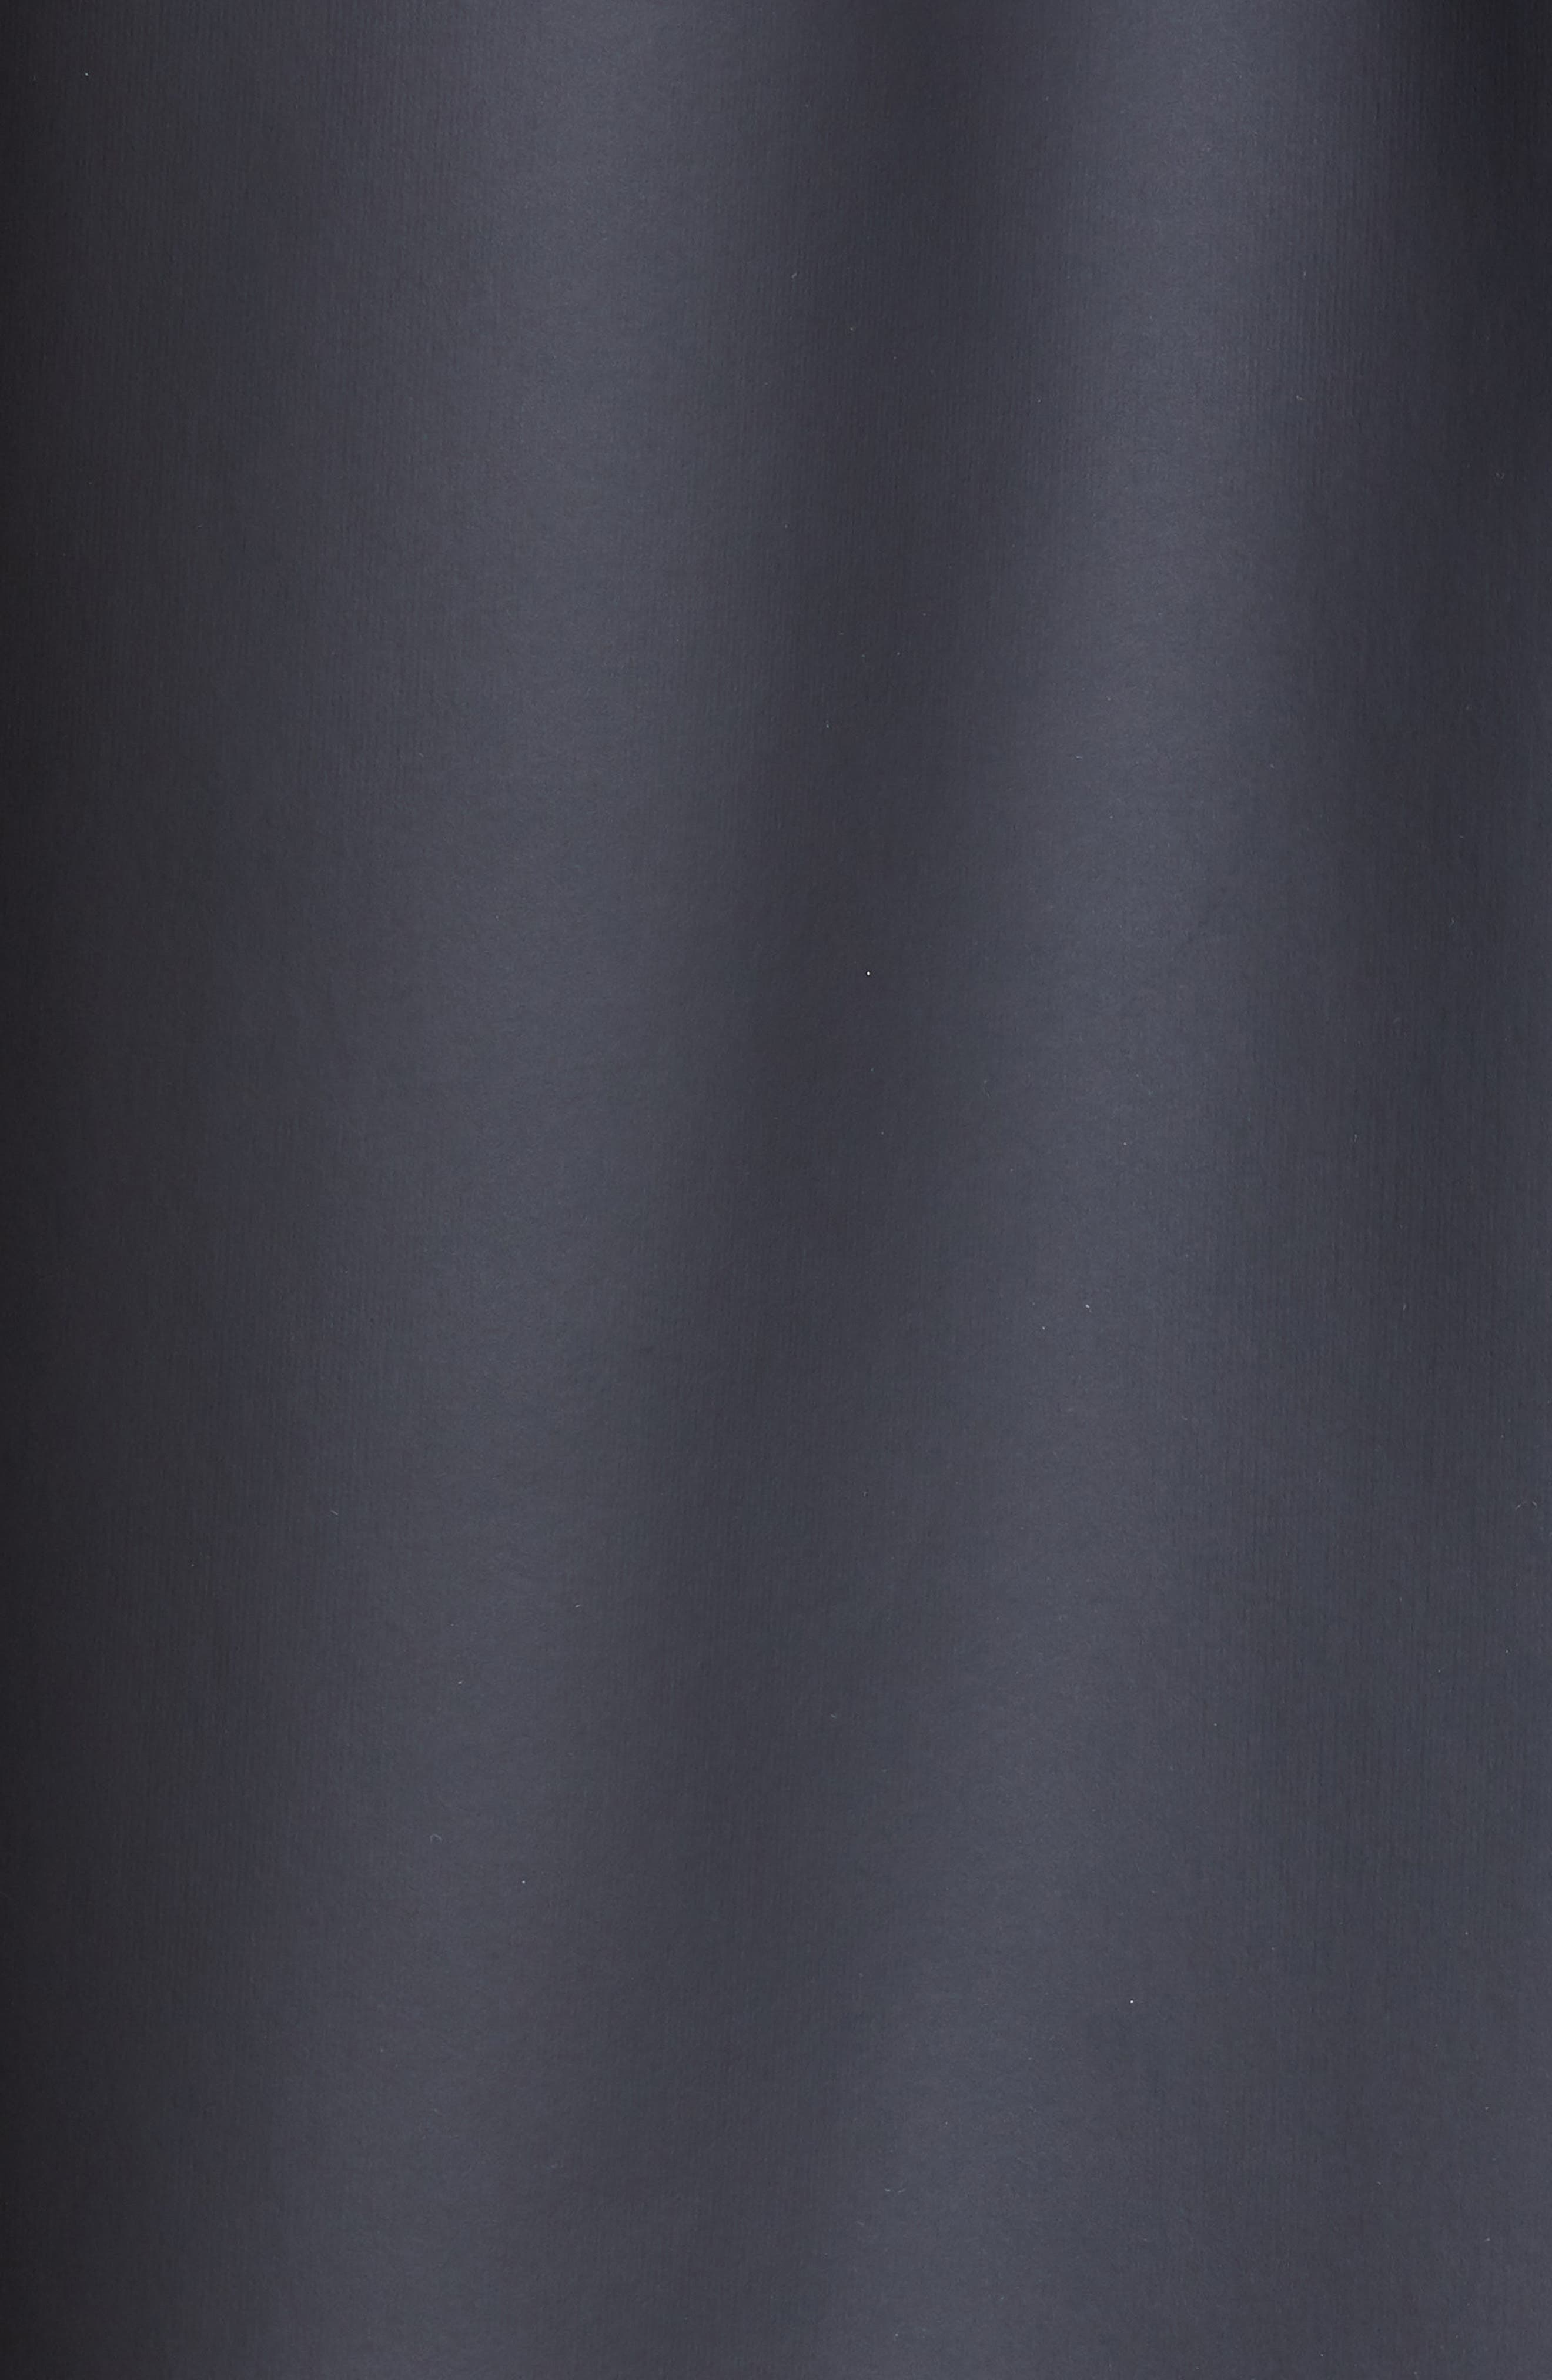 BURBERRY, Hartlebury Coated Rain Coat, Alternate thumbnail 6, color, BLACK / WHITE